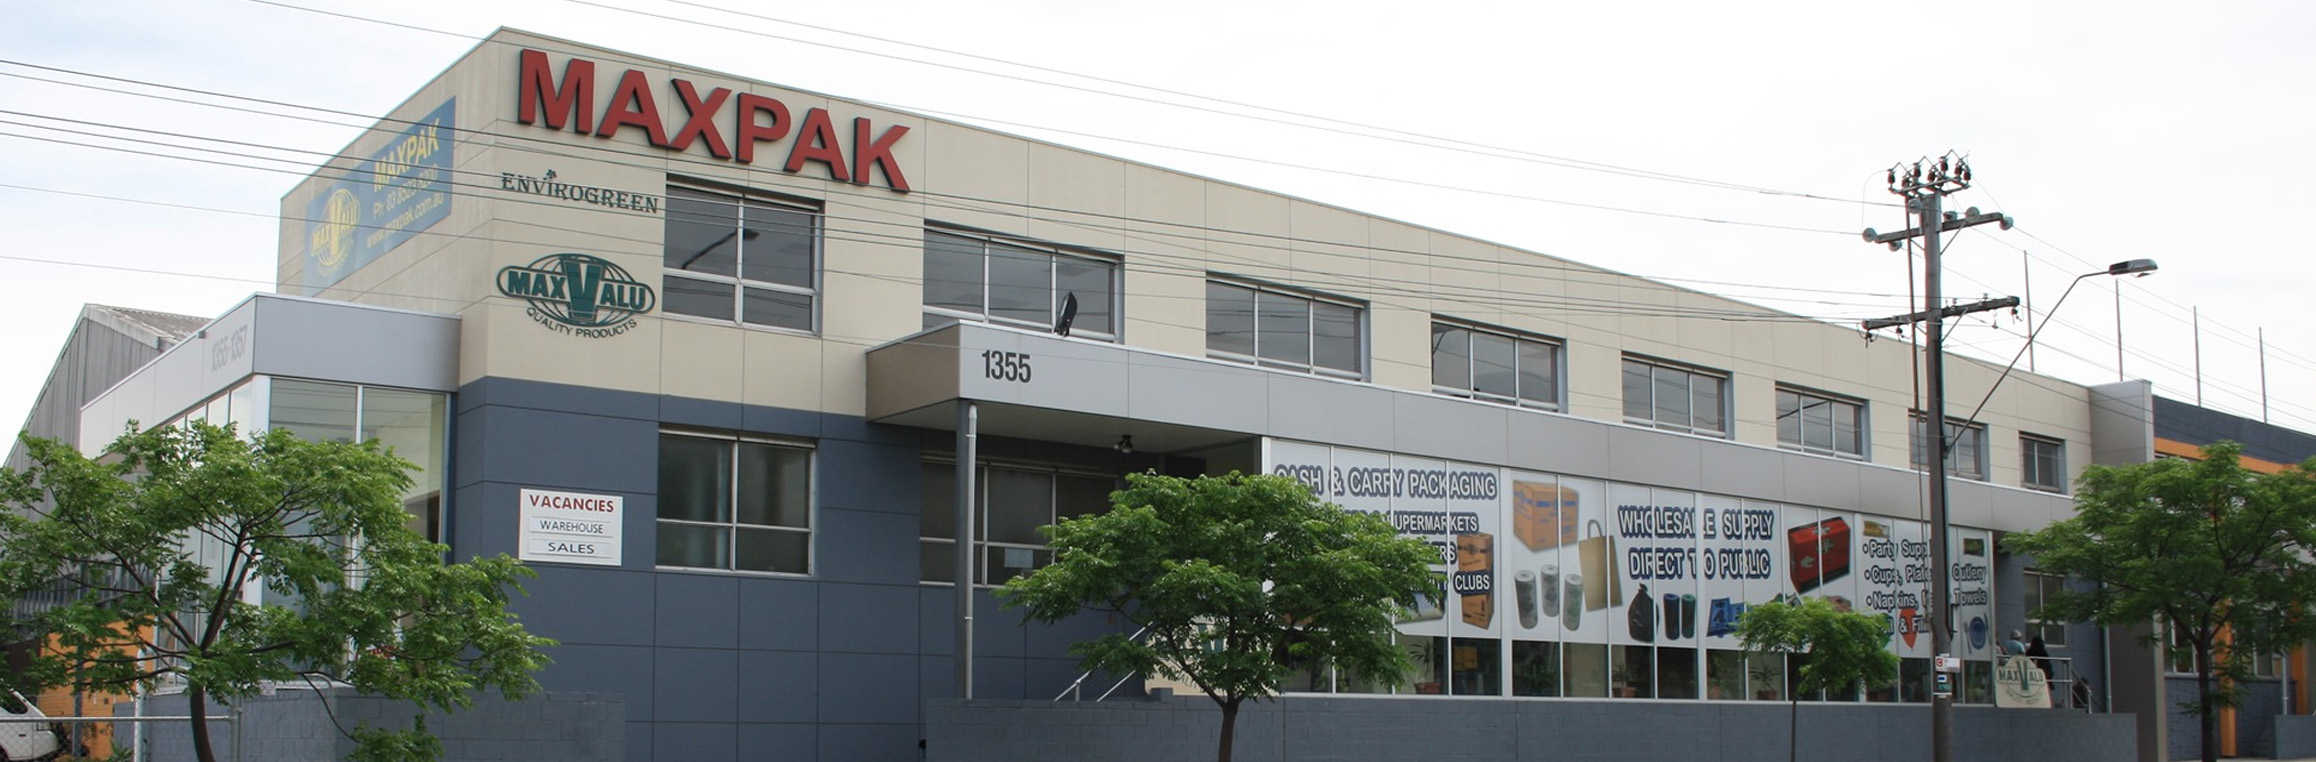 Maxpak Building